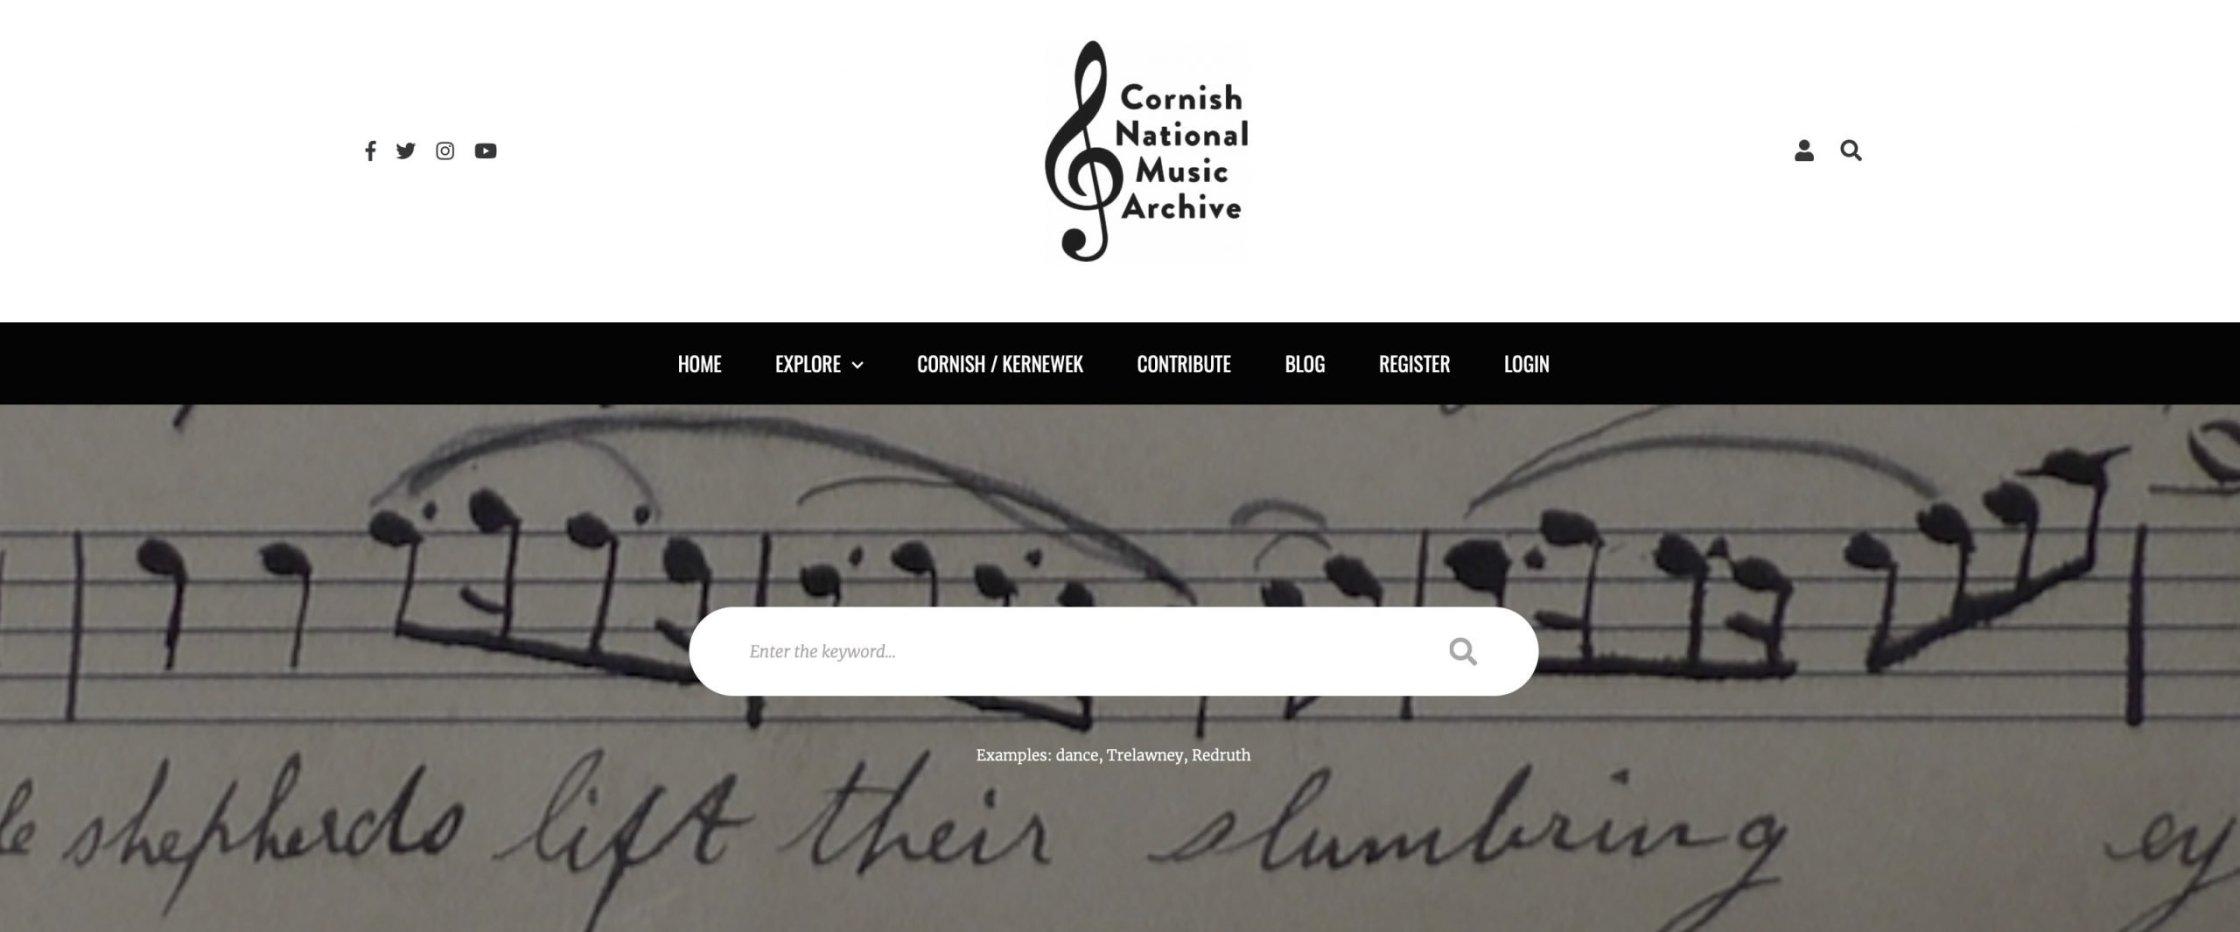 Screenshot of the Cornish National Music Archive website header